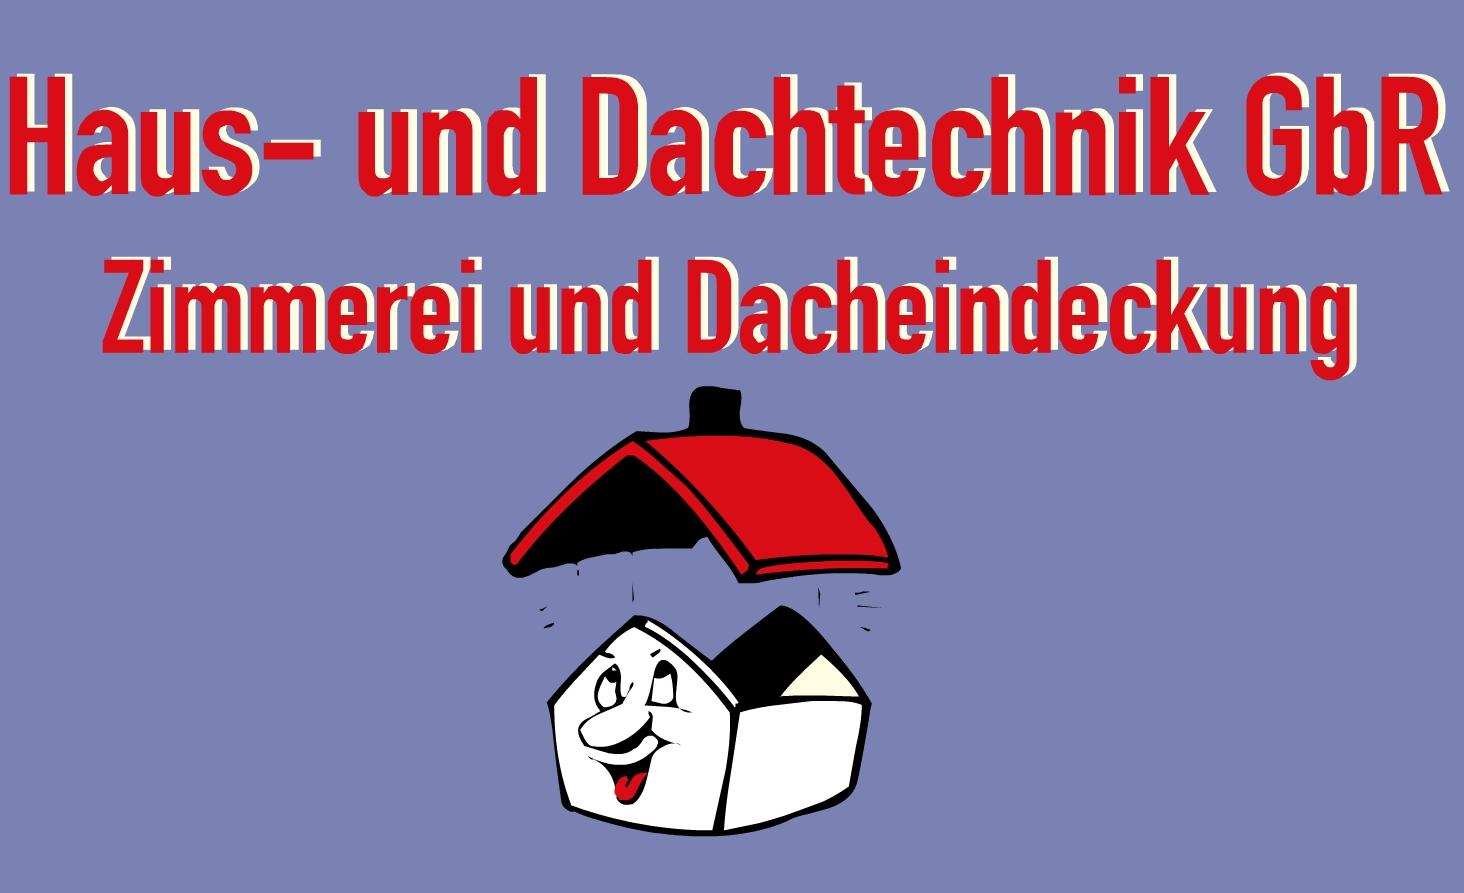 Haus- u. Dachtechnik GbR